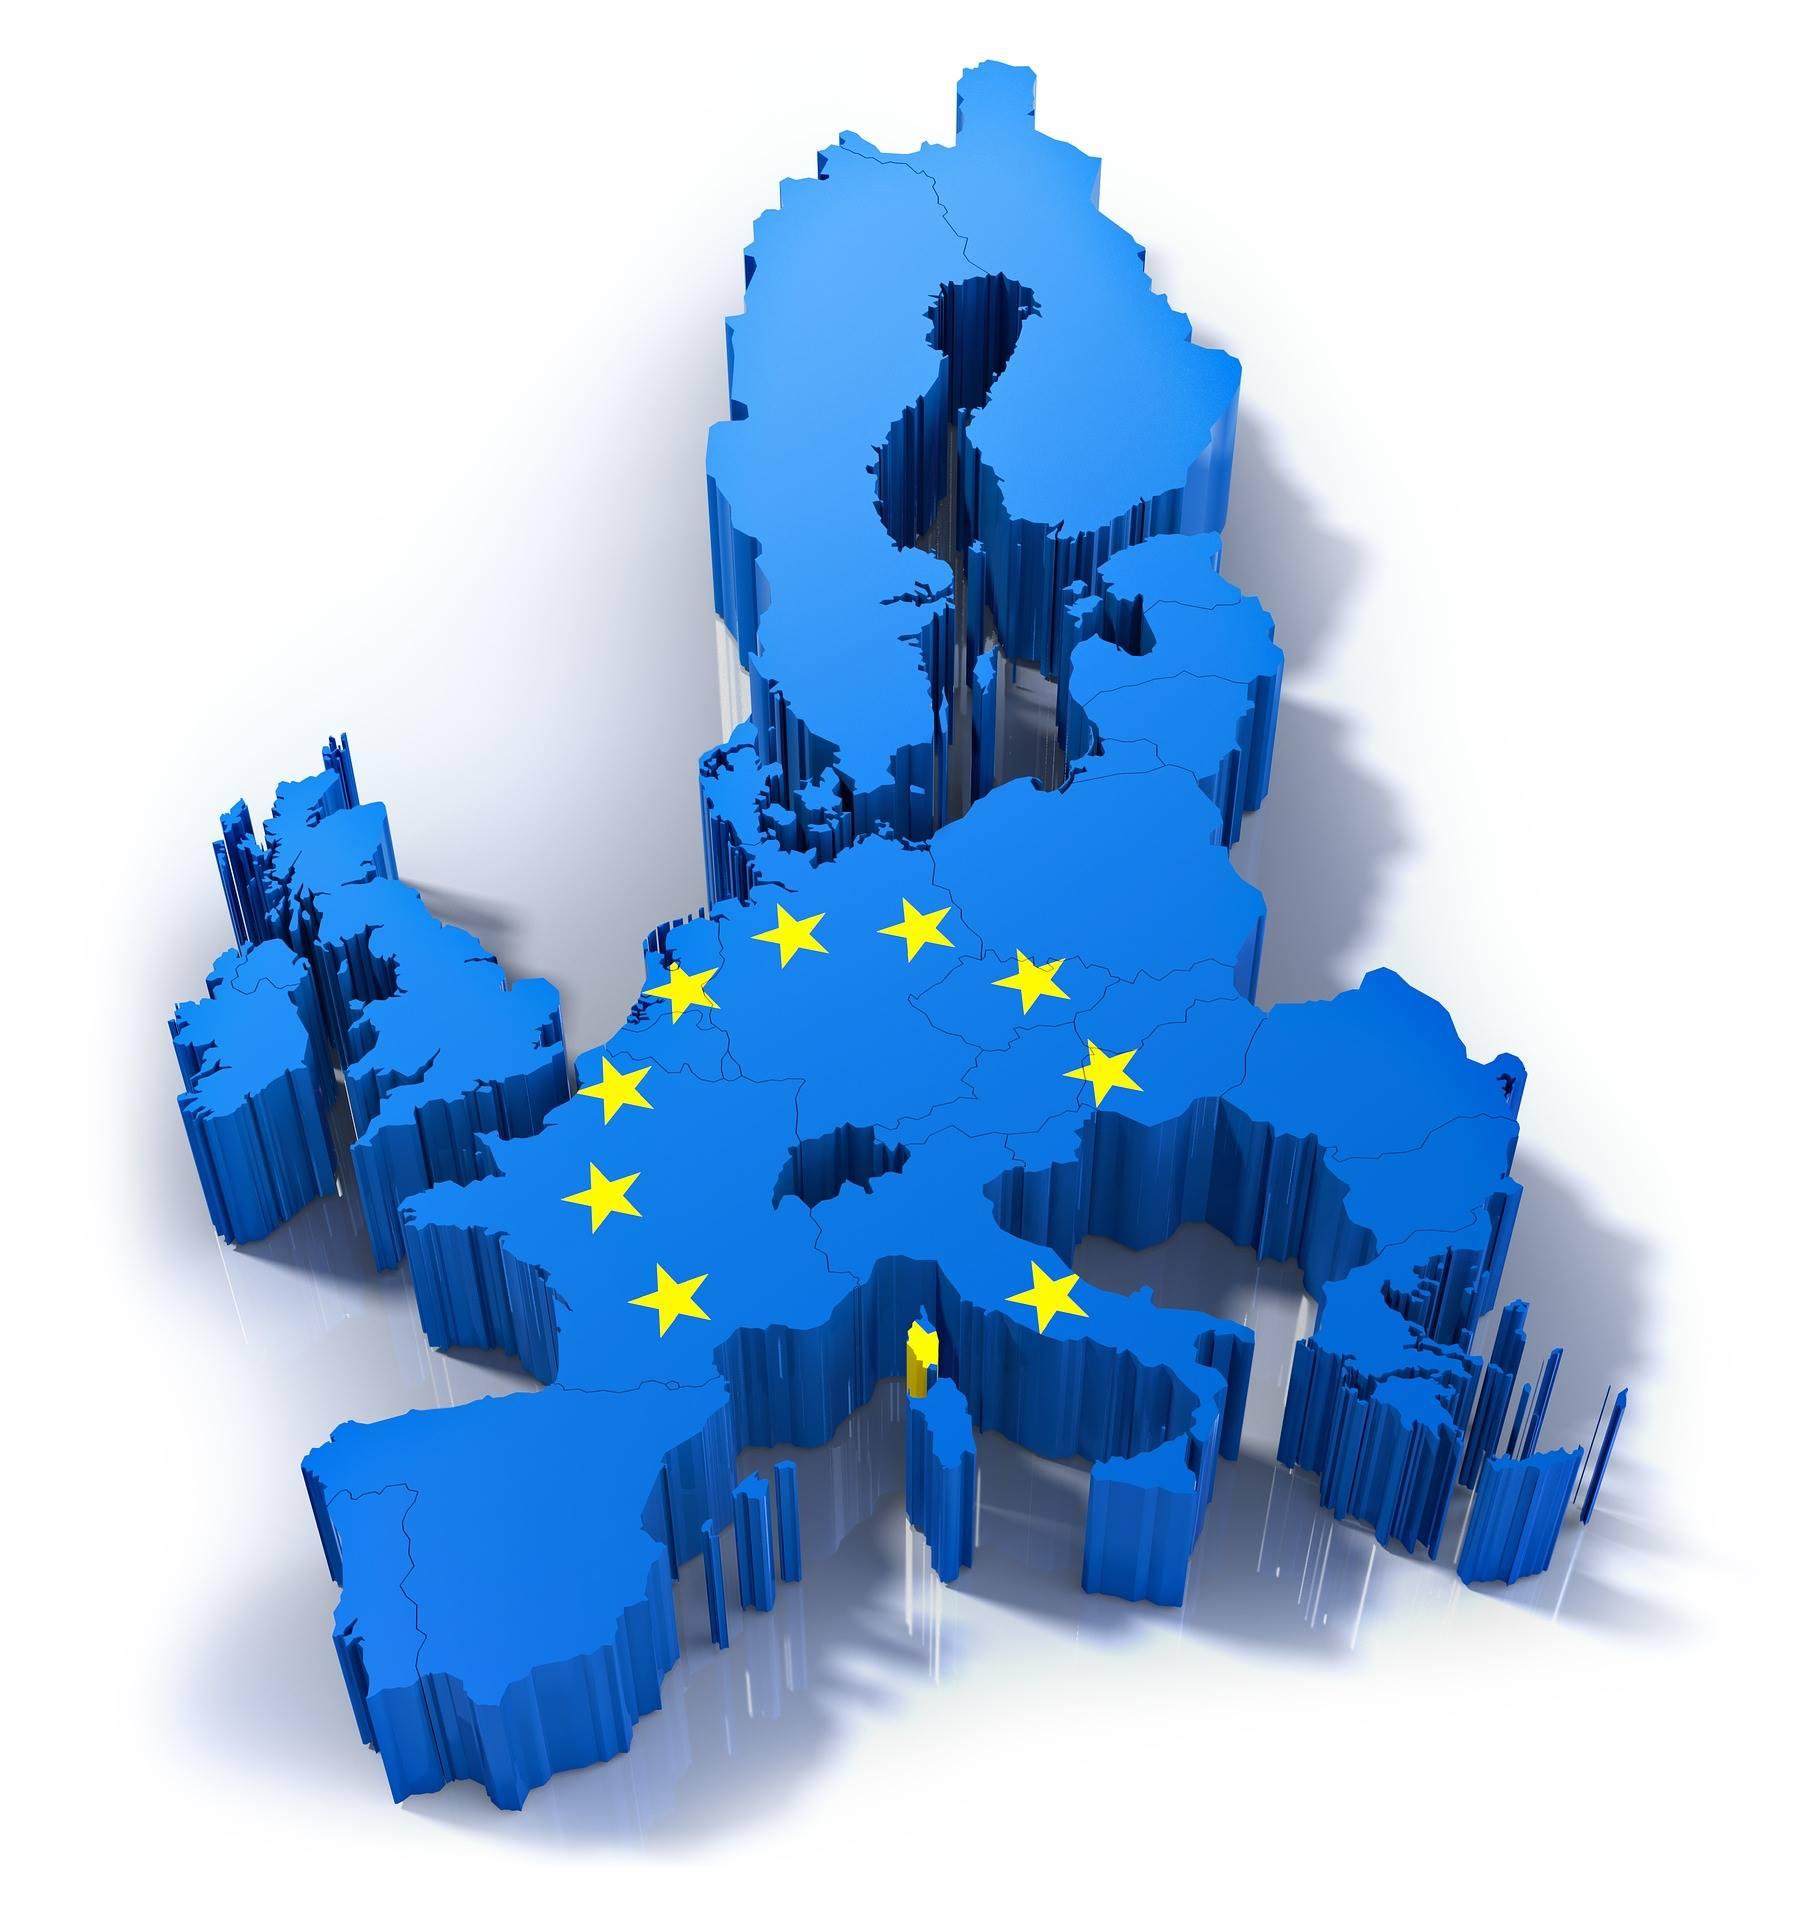 Bild: Pulse of Europe